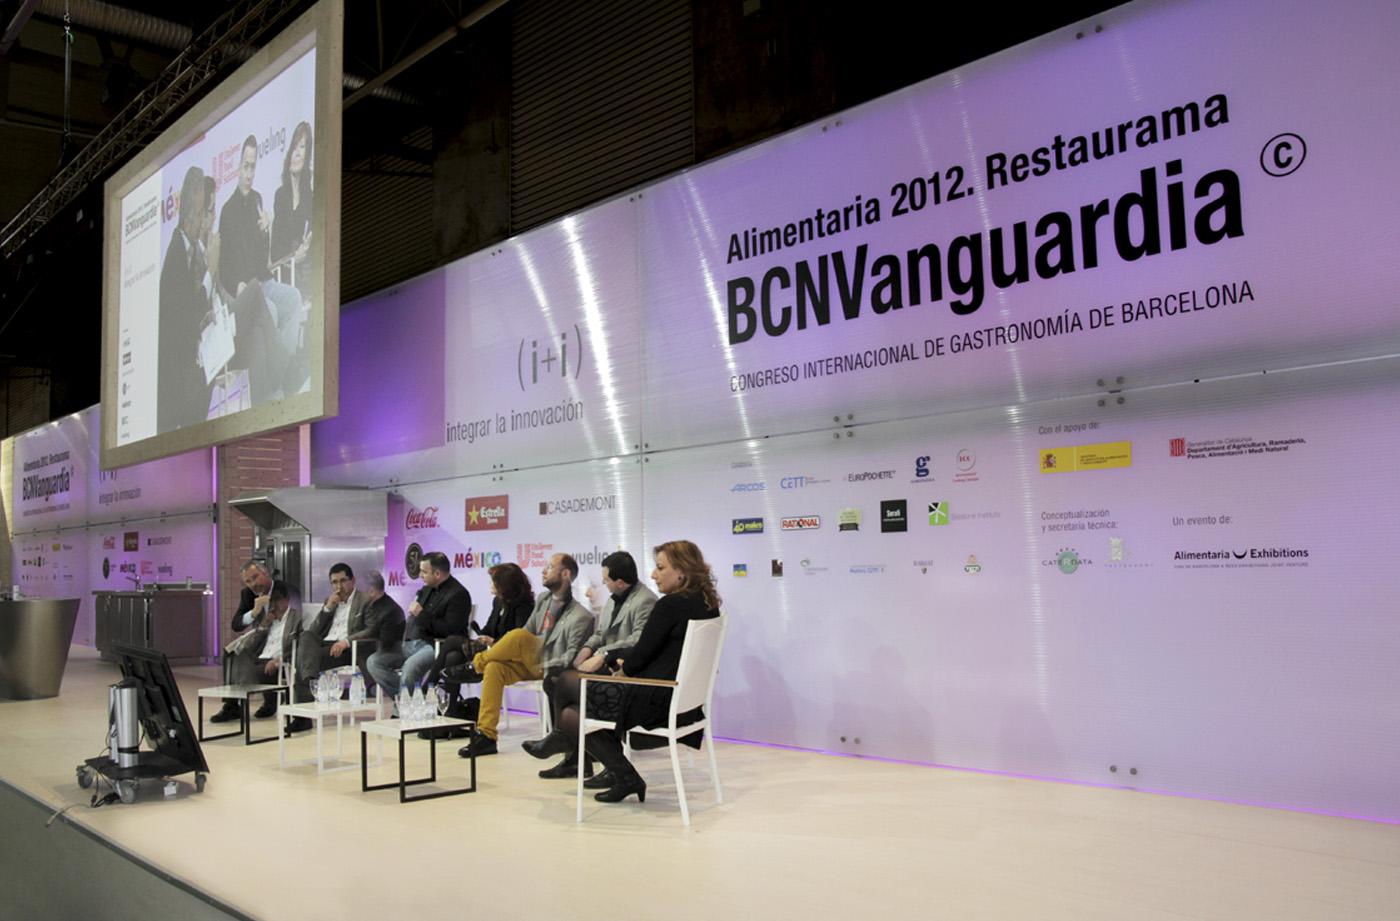 alimentaria-exhibitions-evento-creartiva-bcn-vanguardia